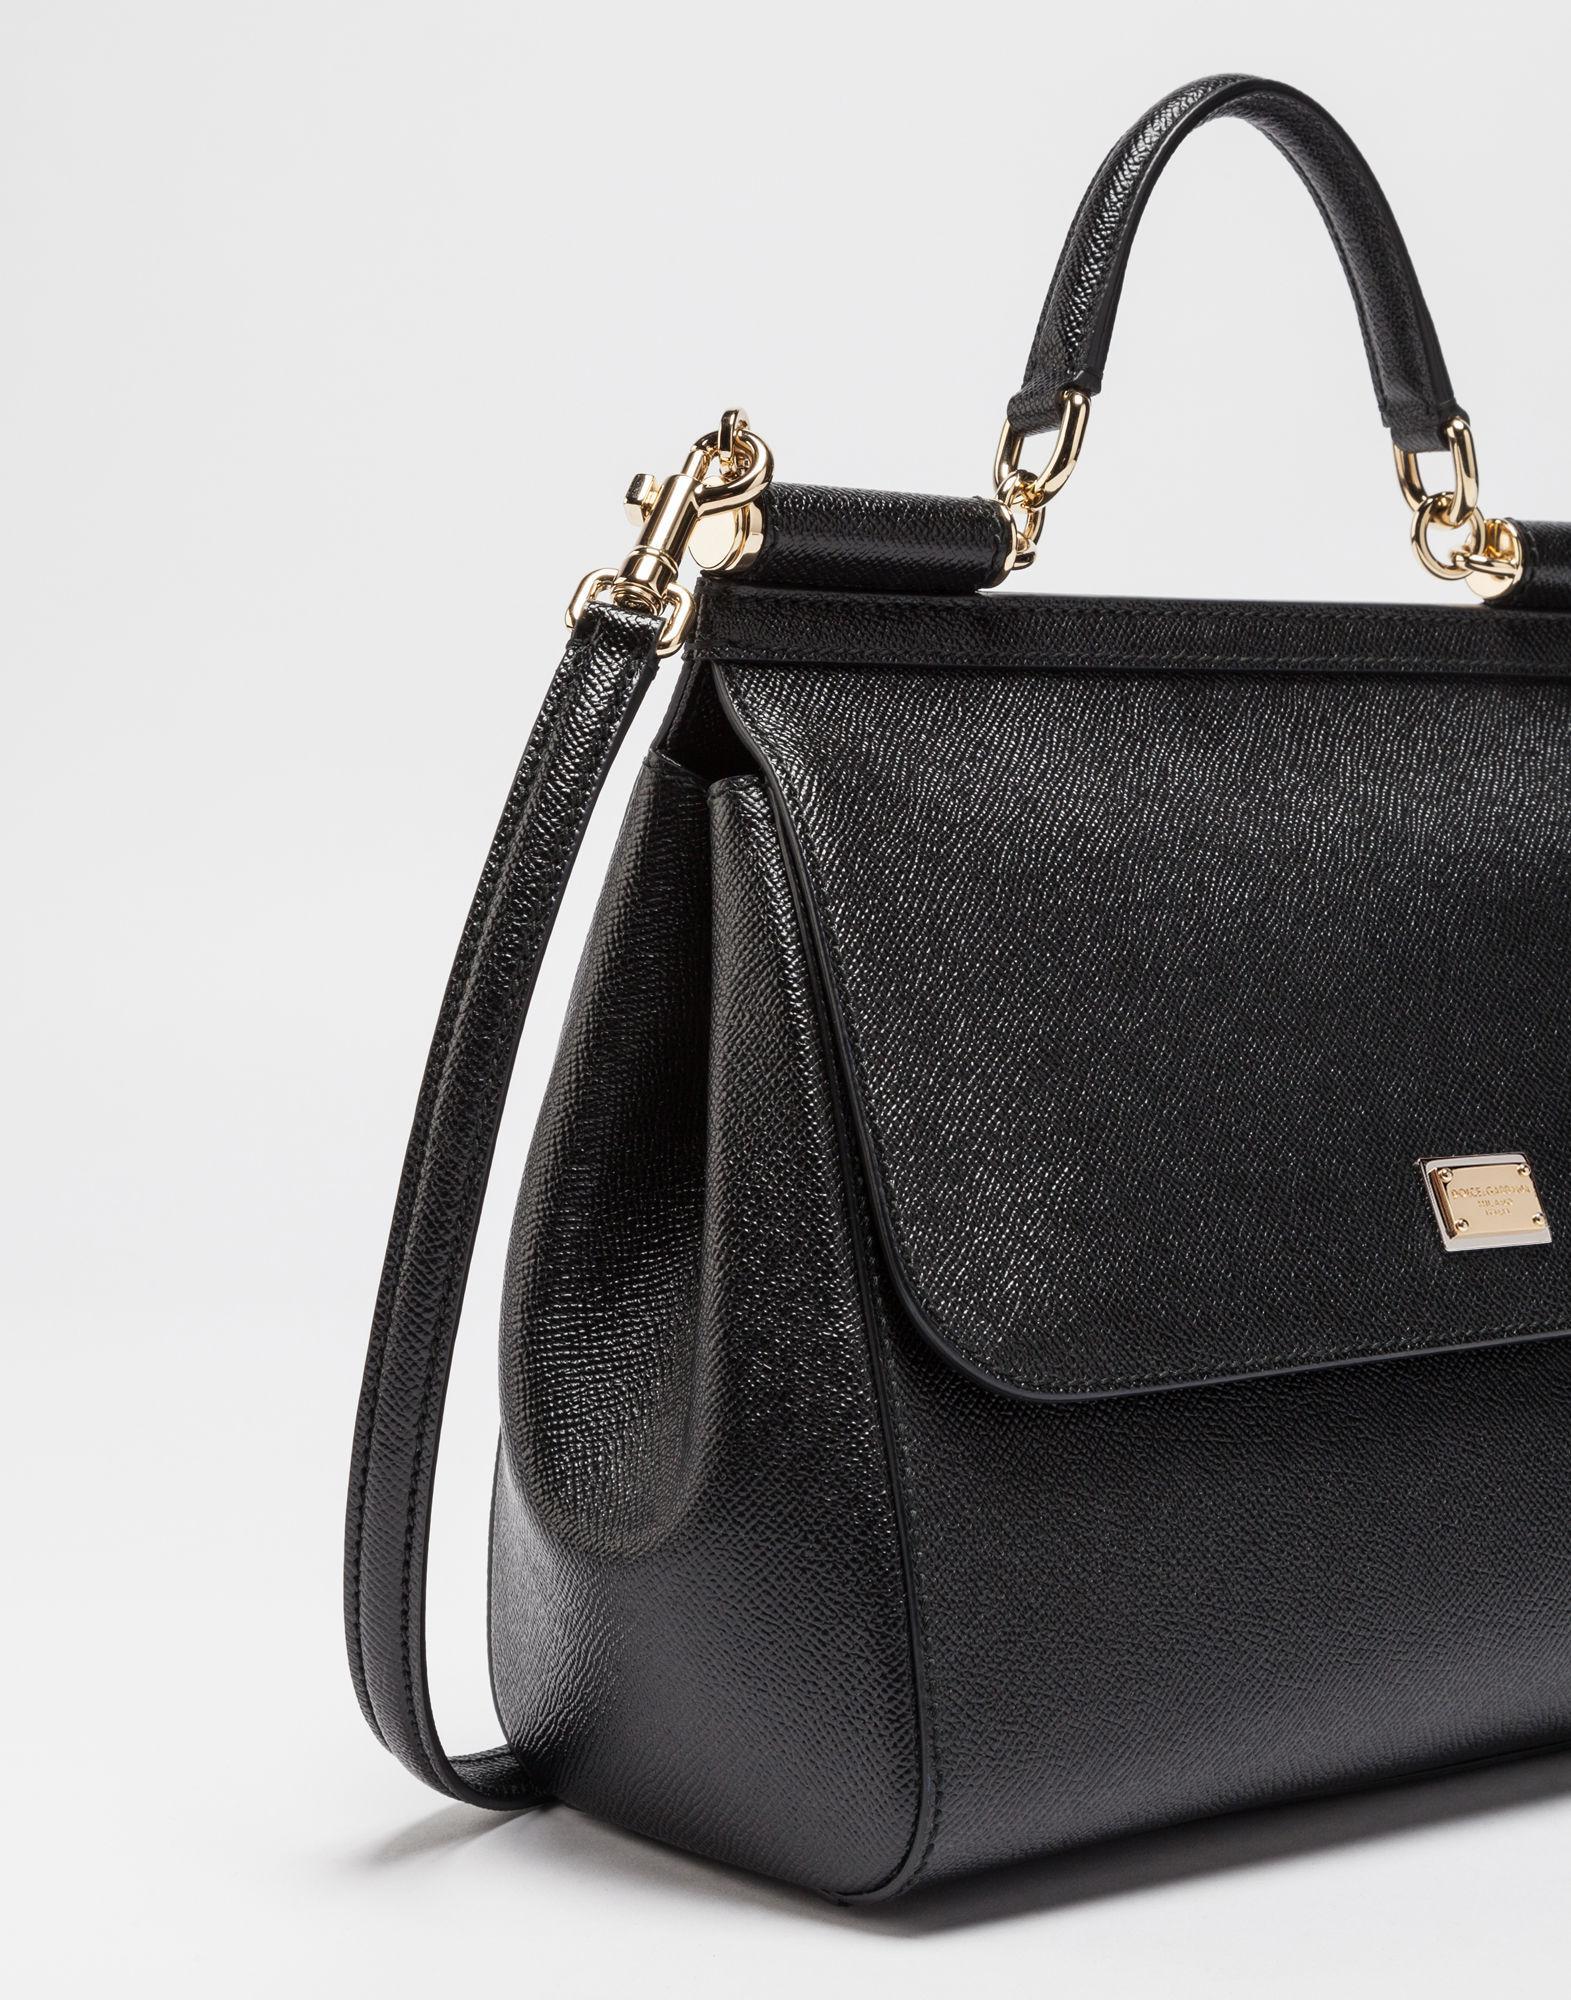 a0b34ea6aa92 Lyst - Dolce   Gabbana Borsa A Mano in Black